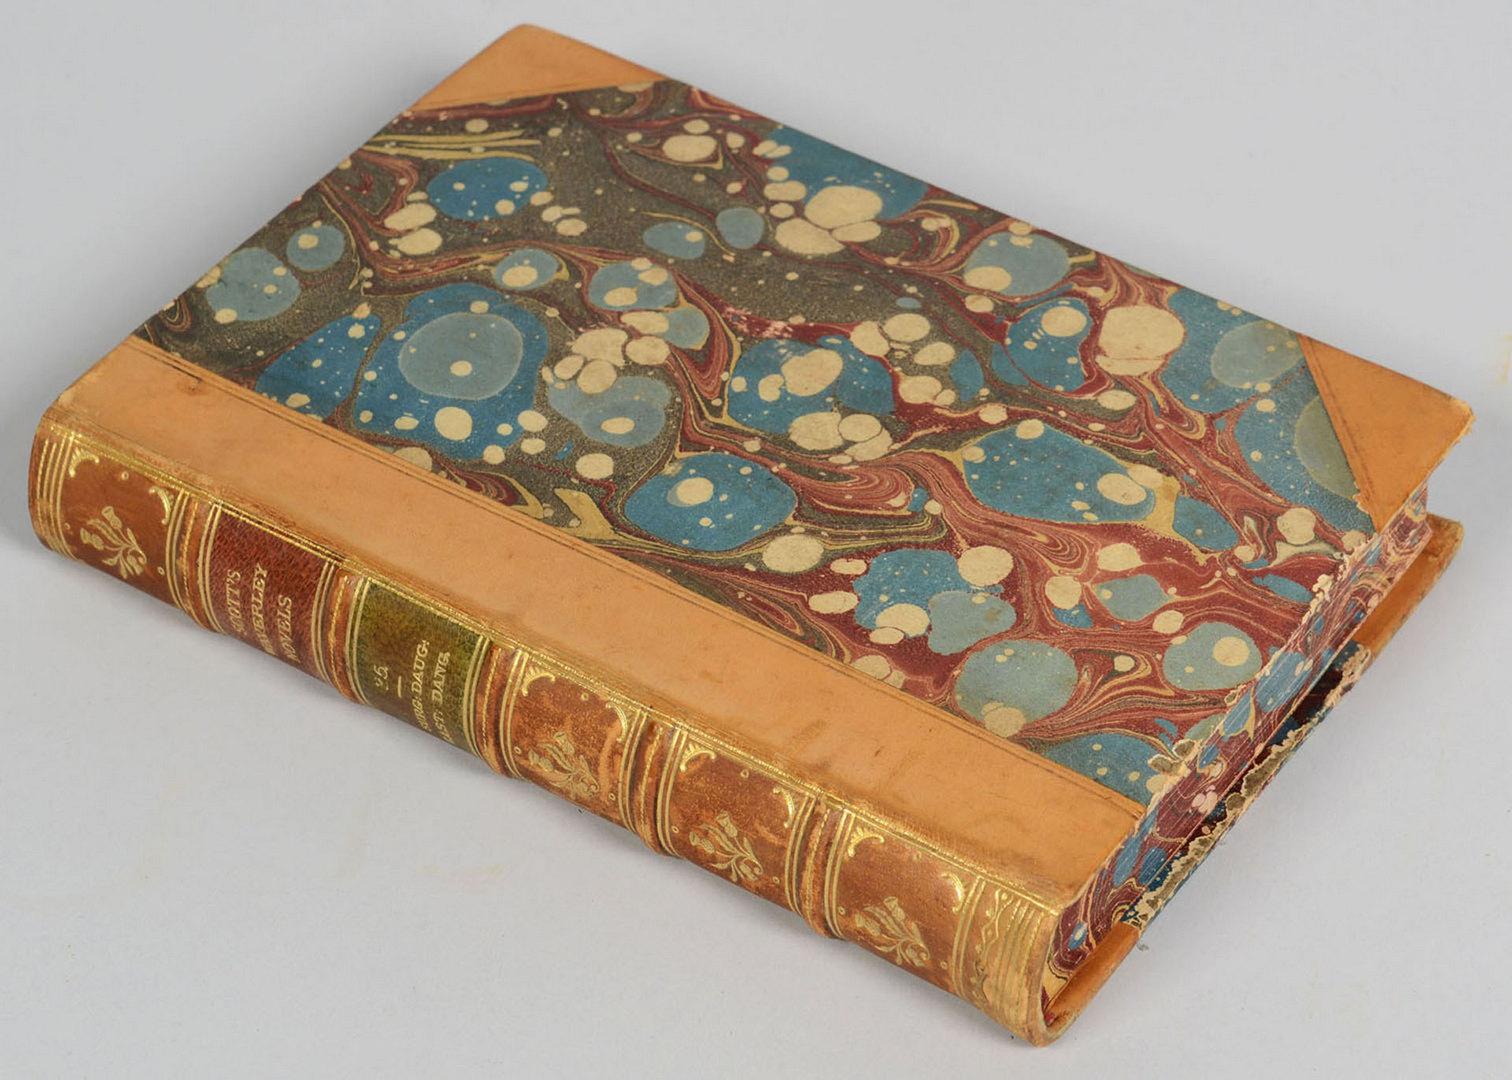 Lot 607: The Waverly Novels by Sir Walter Scott, 25 Vols.